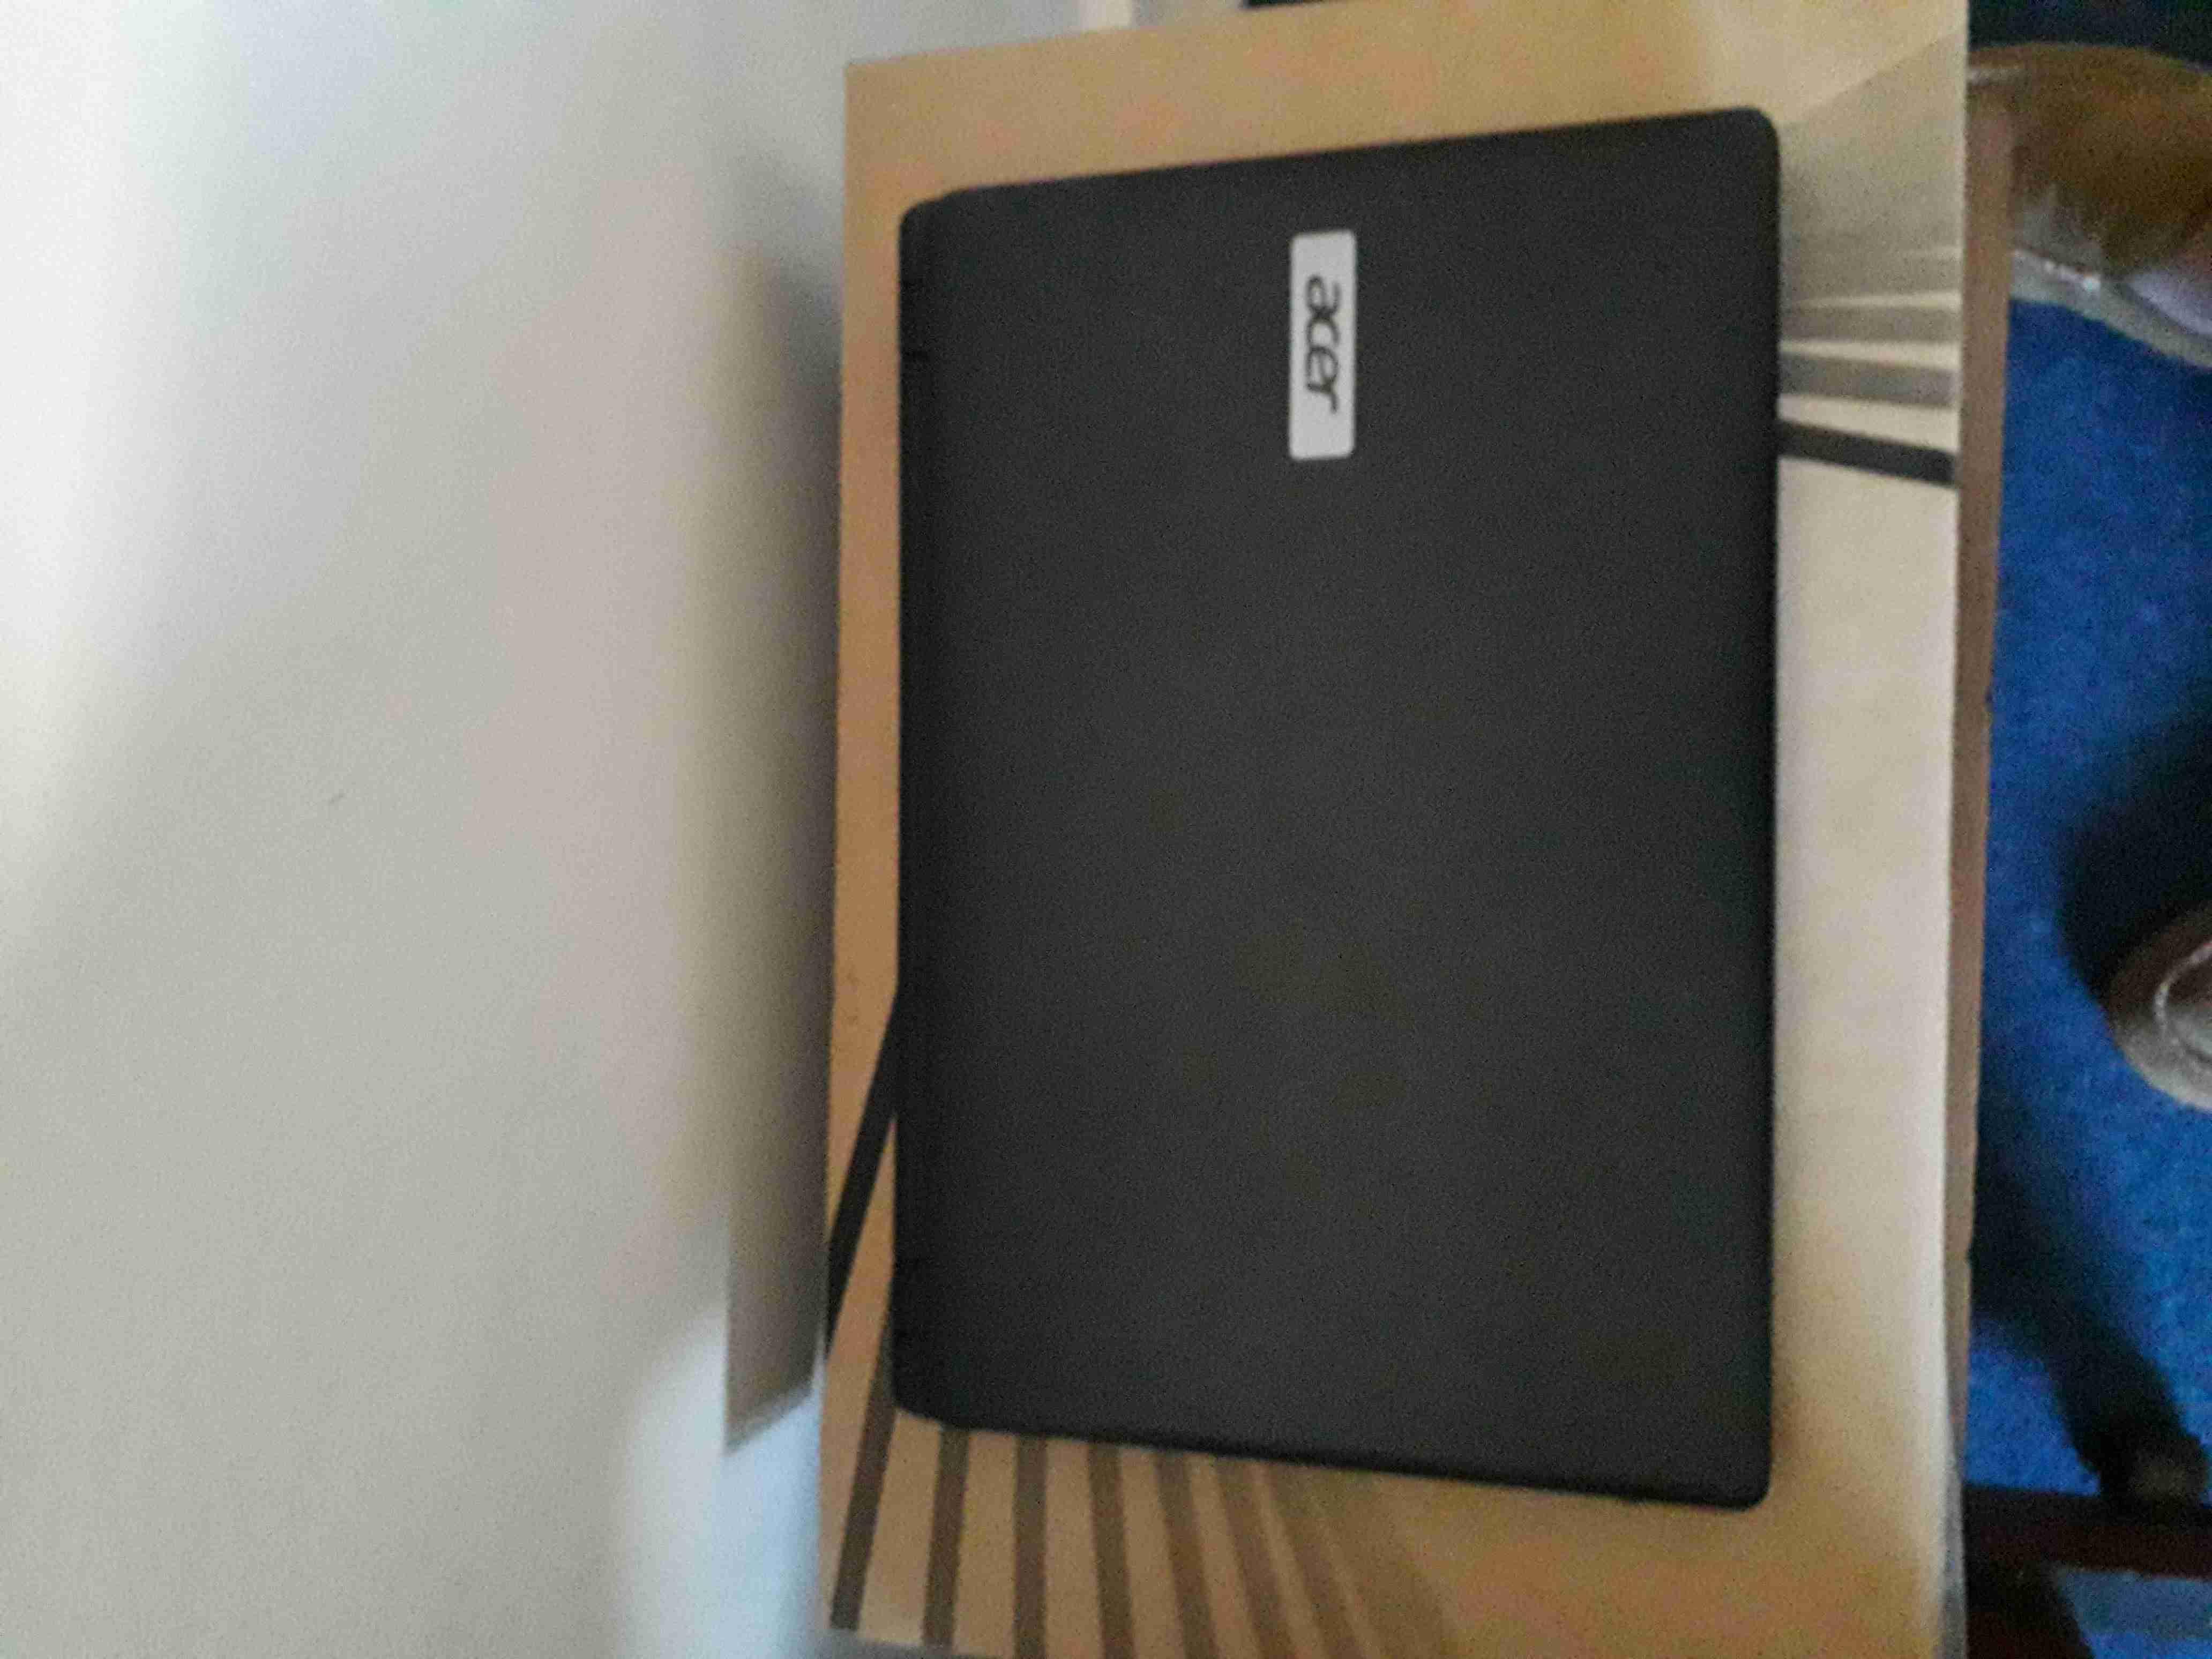 Lenovo Thinkpad T440s i5 8GB Ram 256SSD Slim Laptop-  لاب توب ايسر لا تنسَ أنك...